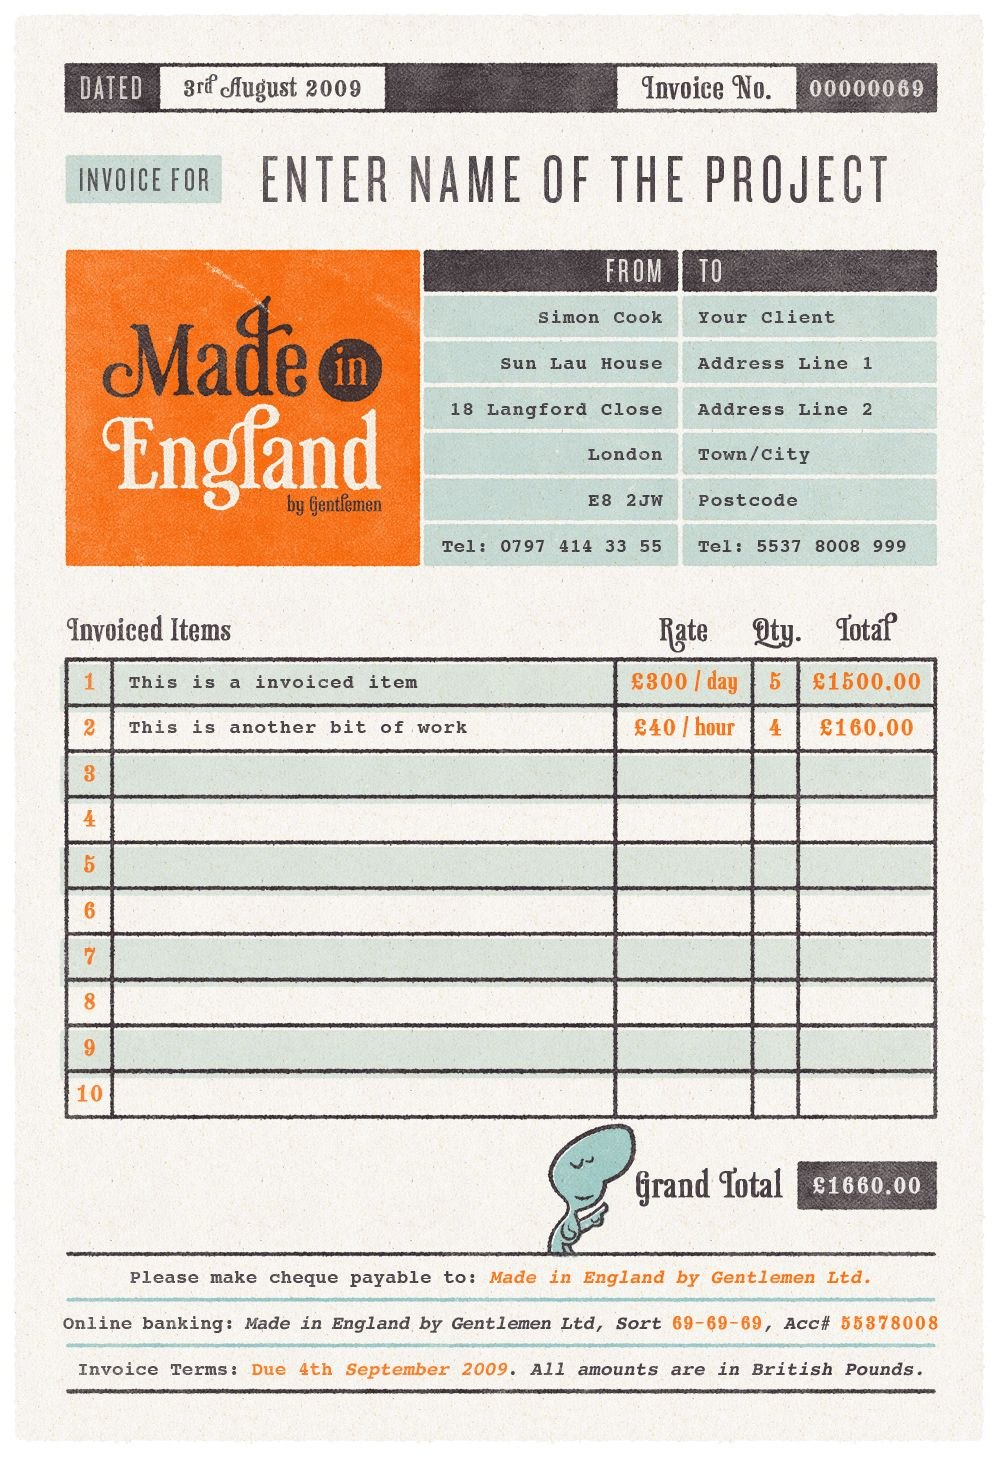 Free Invoice Template For Designers  Illustrators  Website Design Pertaining To Media Invoice Template